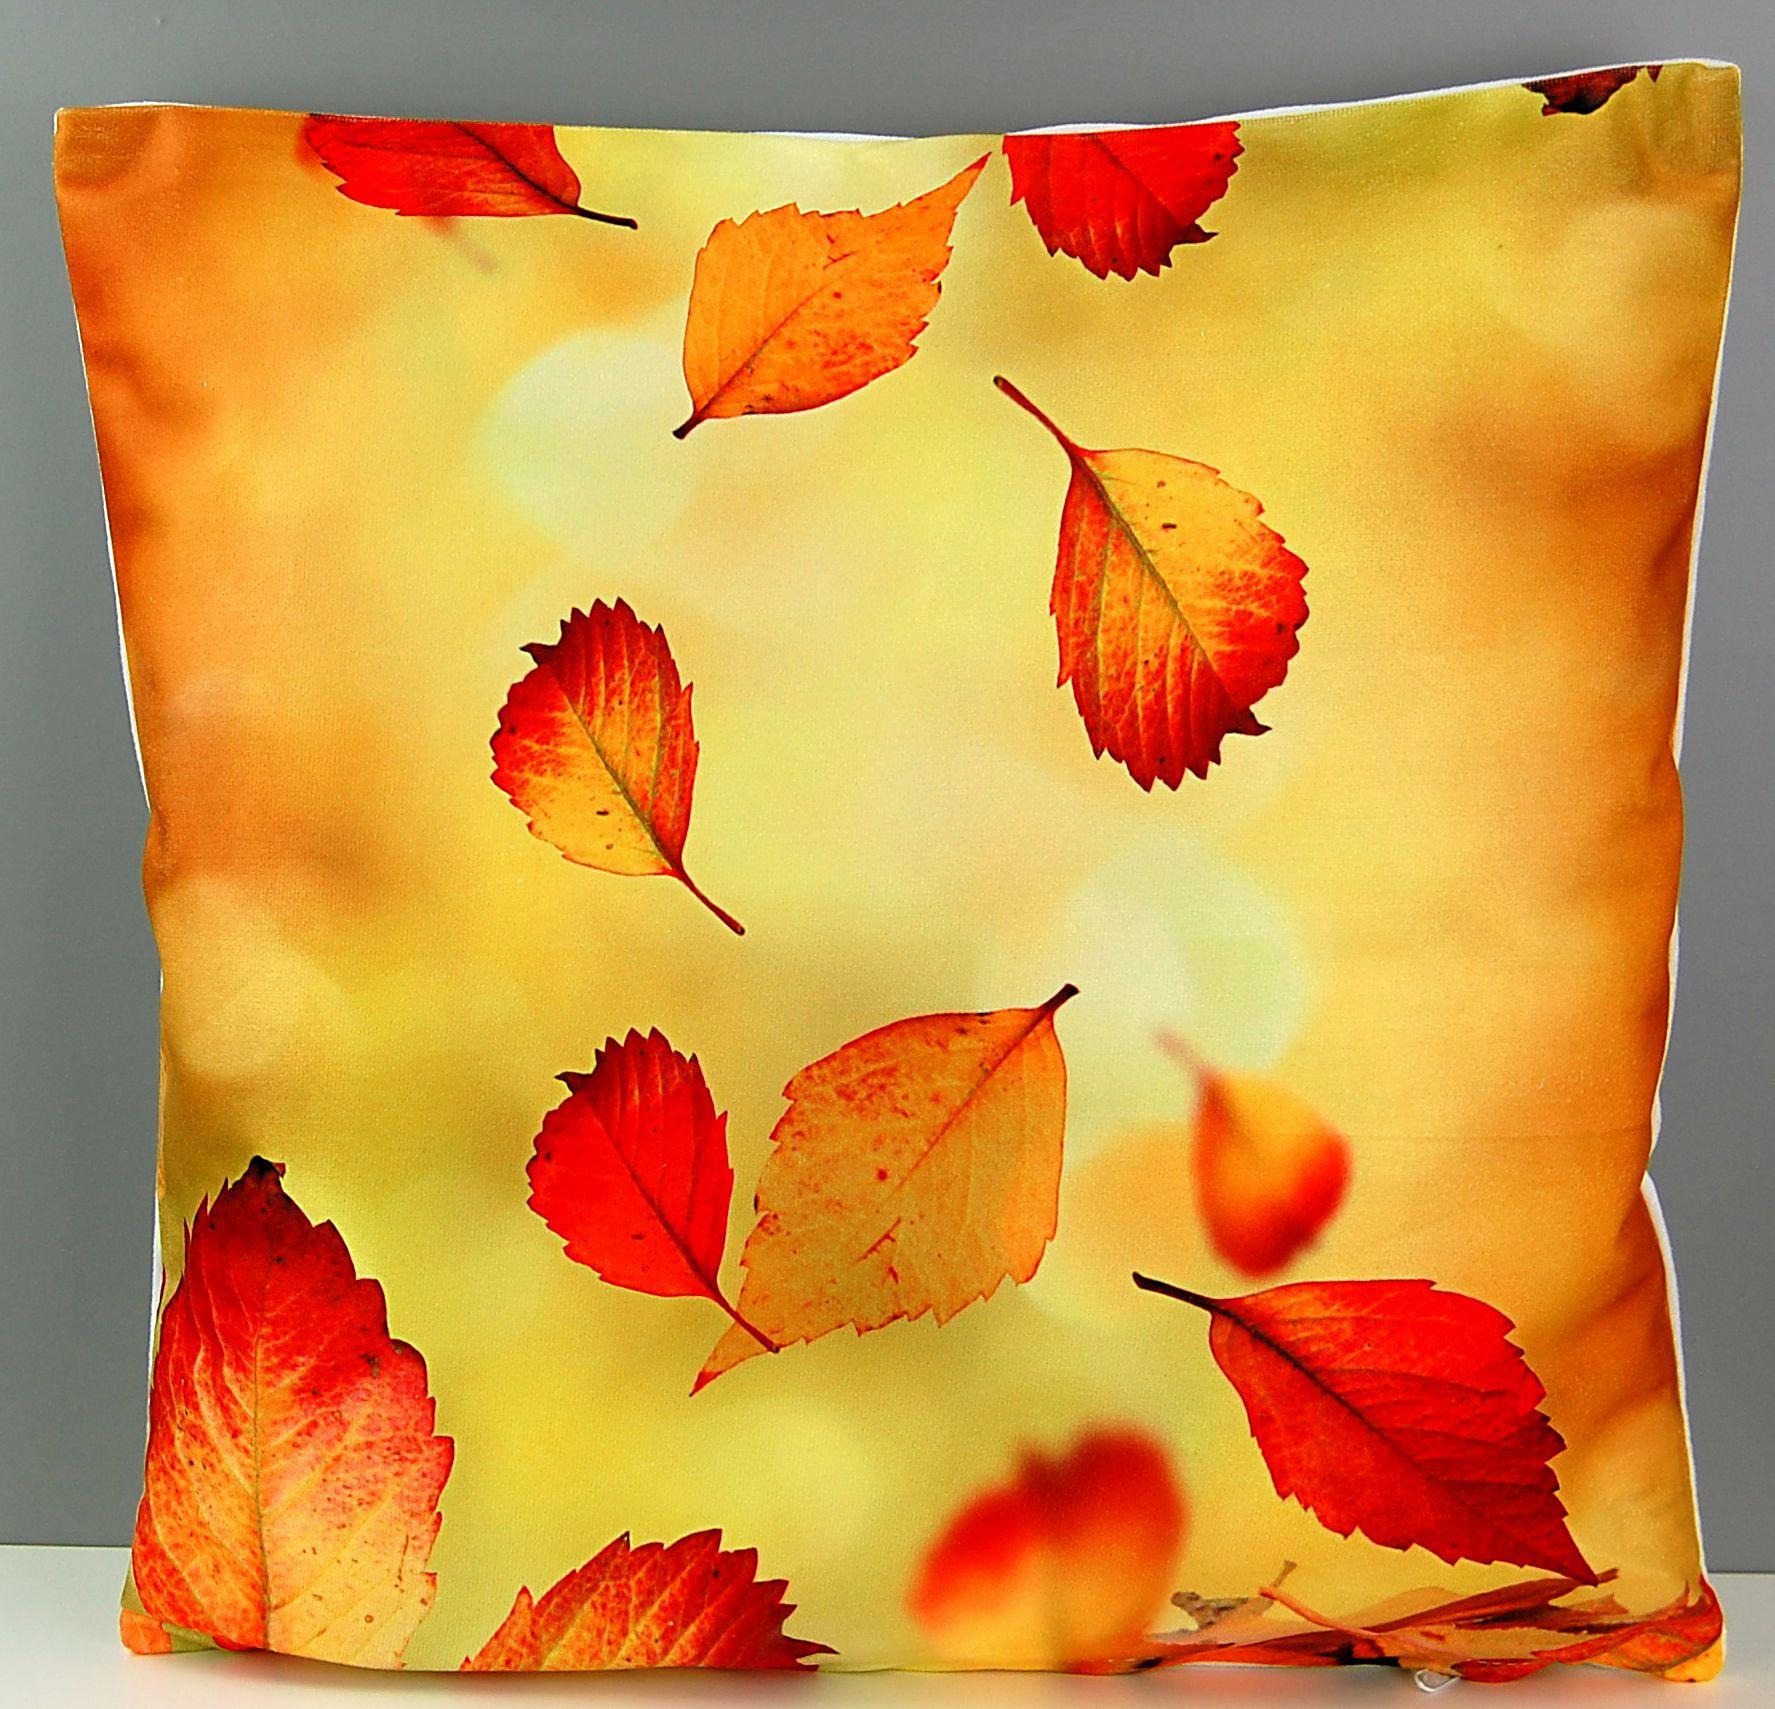 kissenh lle 40x40 cm kissenbezug herbst sofakissen kissen bunt bl tter sunflower ebay. Black Bedroom Furniture Sets. Home Design Ideas